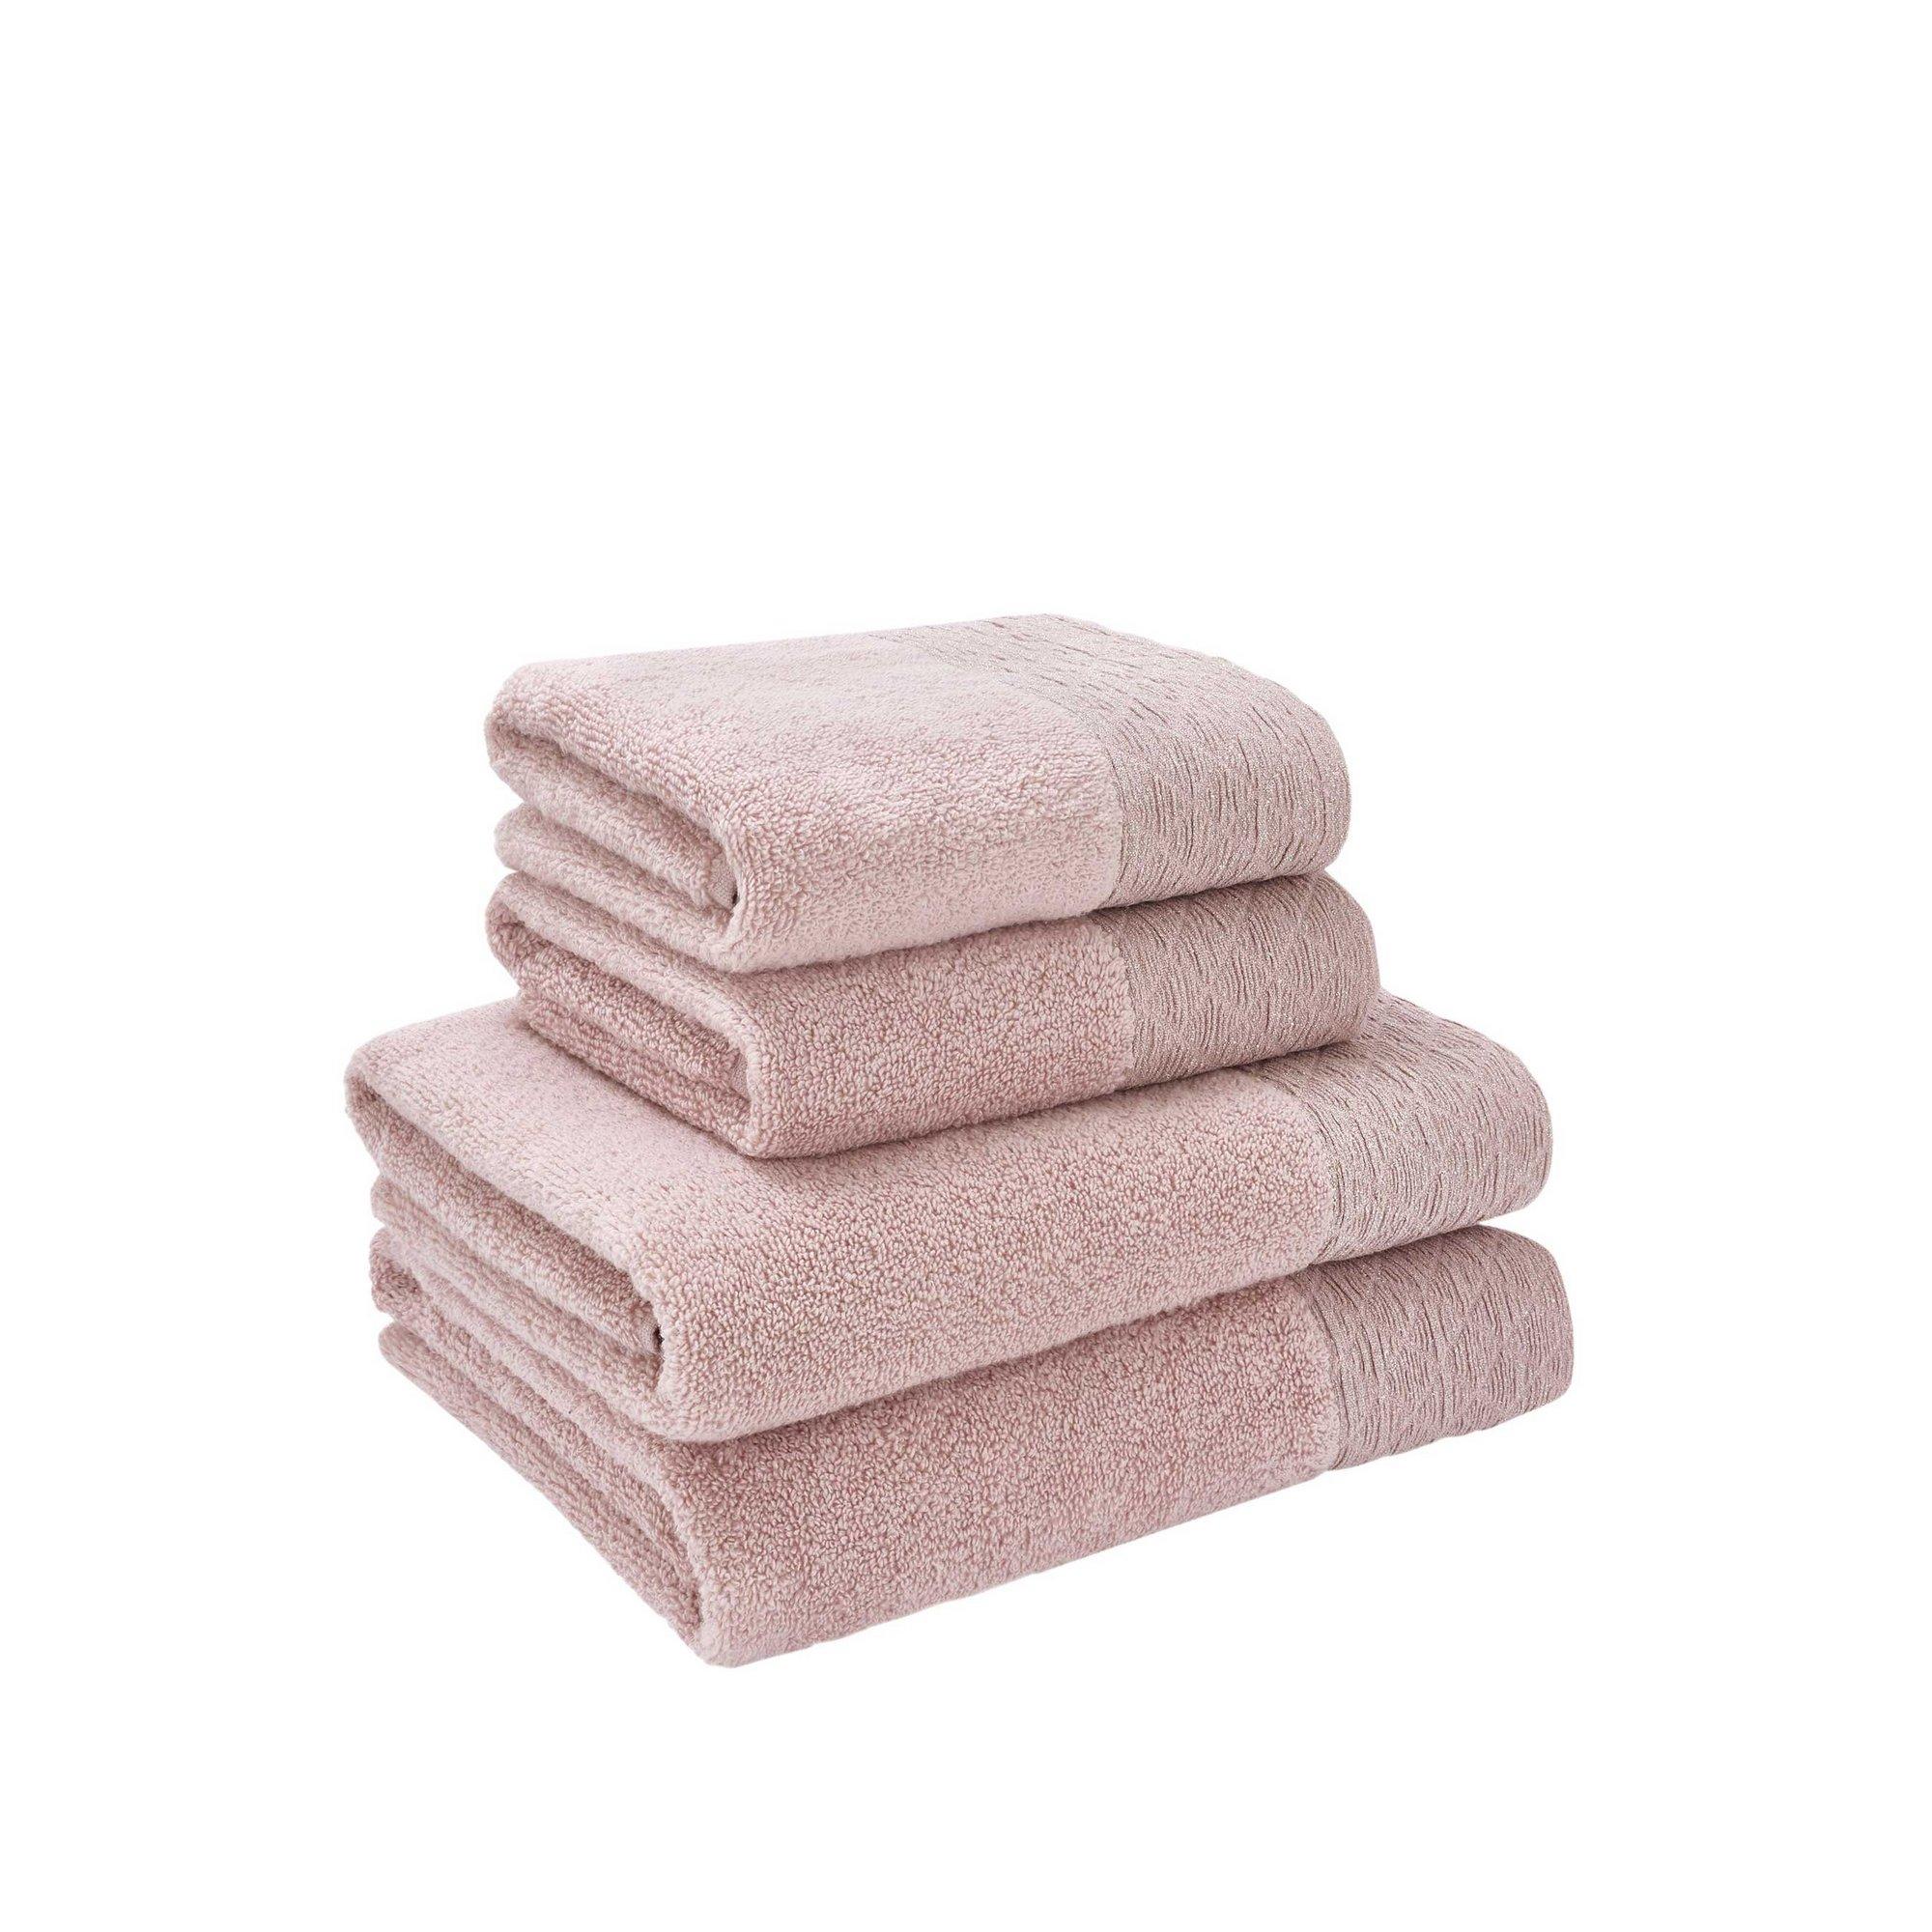 Image of Catherine Lansfield Zero Twist Sparkle 4 Piece Towel Bale